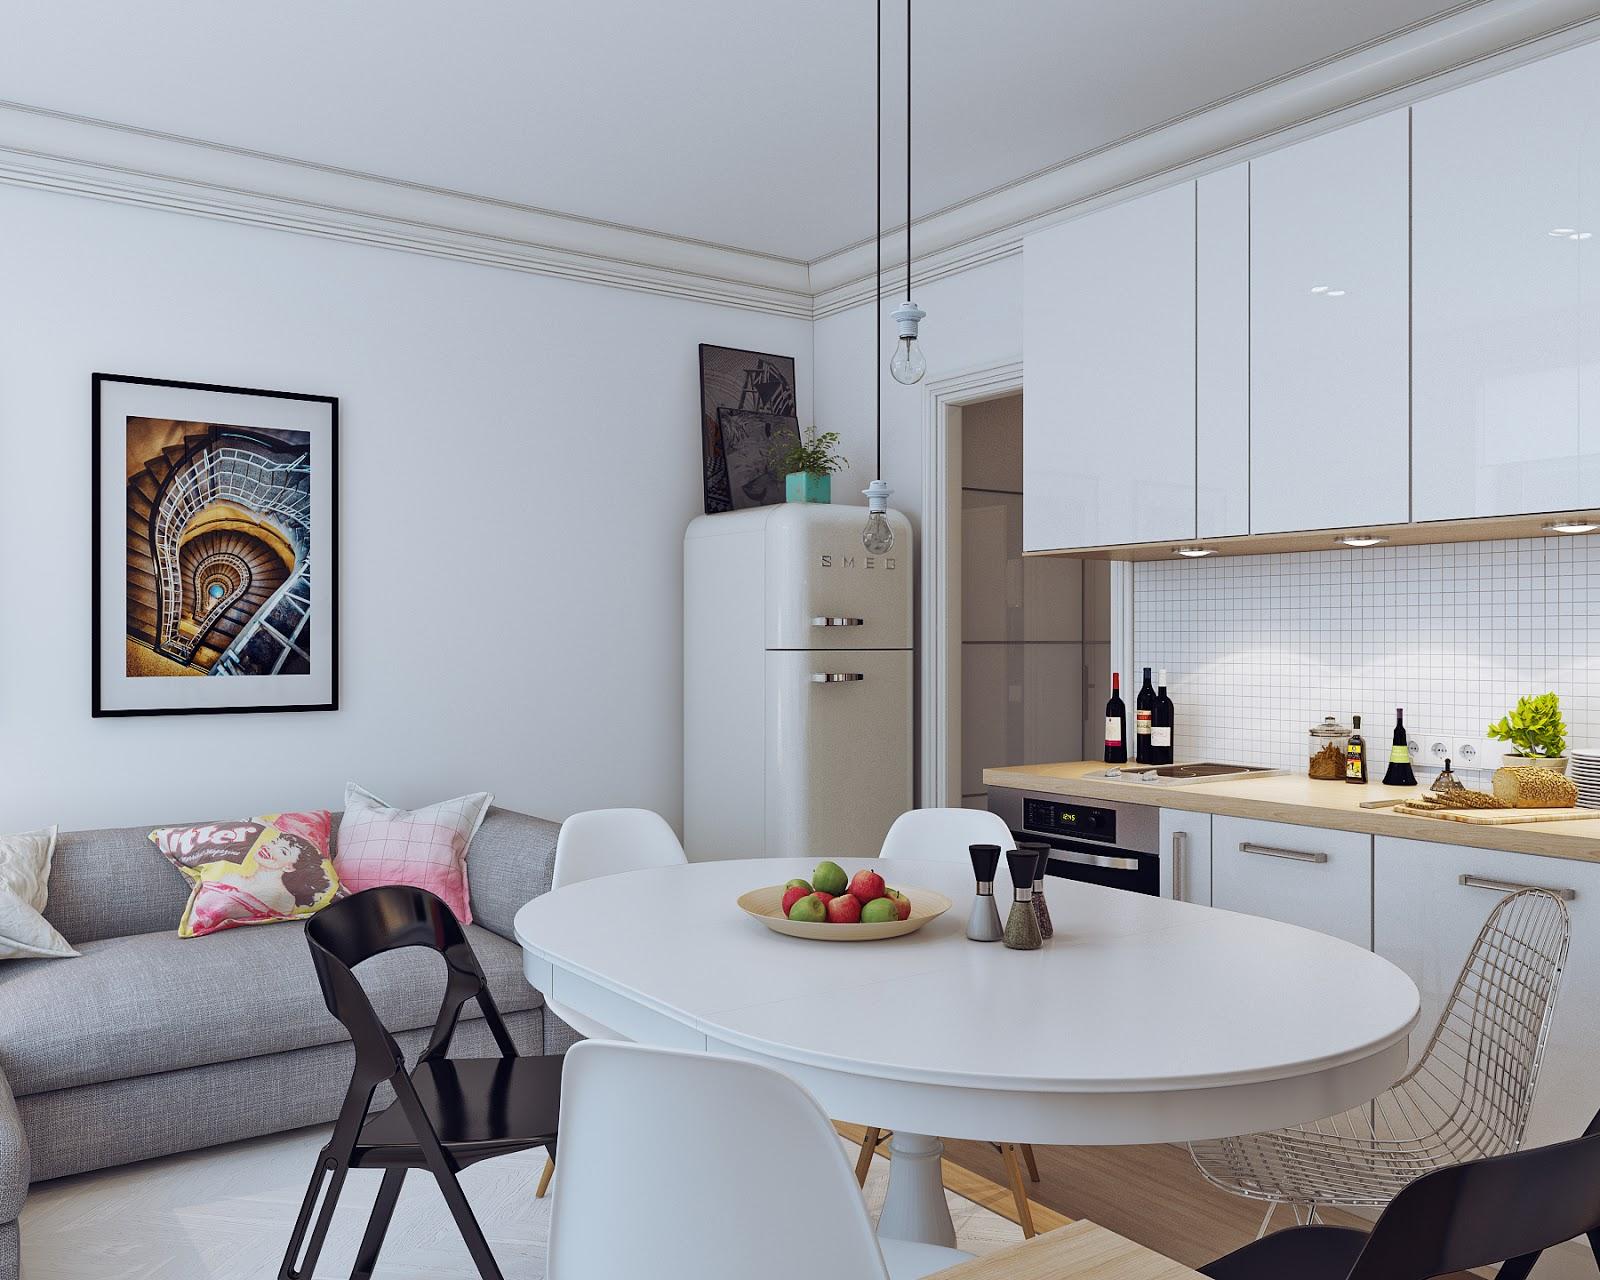 #80724B un parquet trattato e di color bianco infatti dona all ambiente un  1600x1280 píxeis em Como Decorar La Sala Comedor De Un Apartamento Pequeño